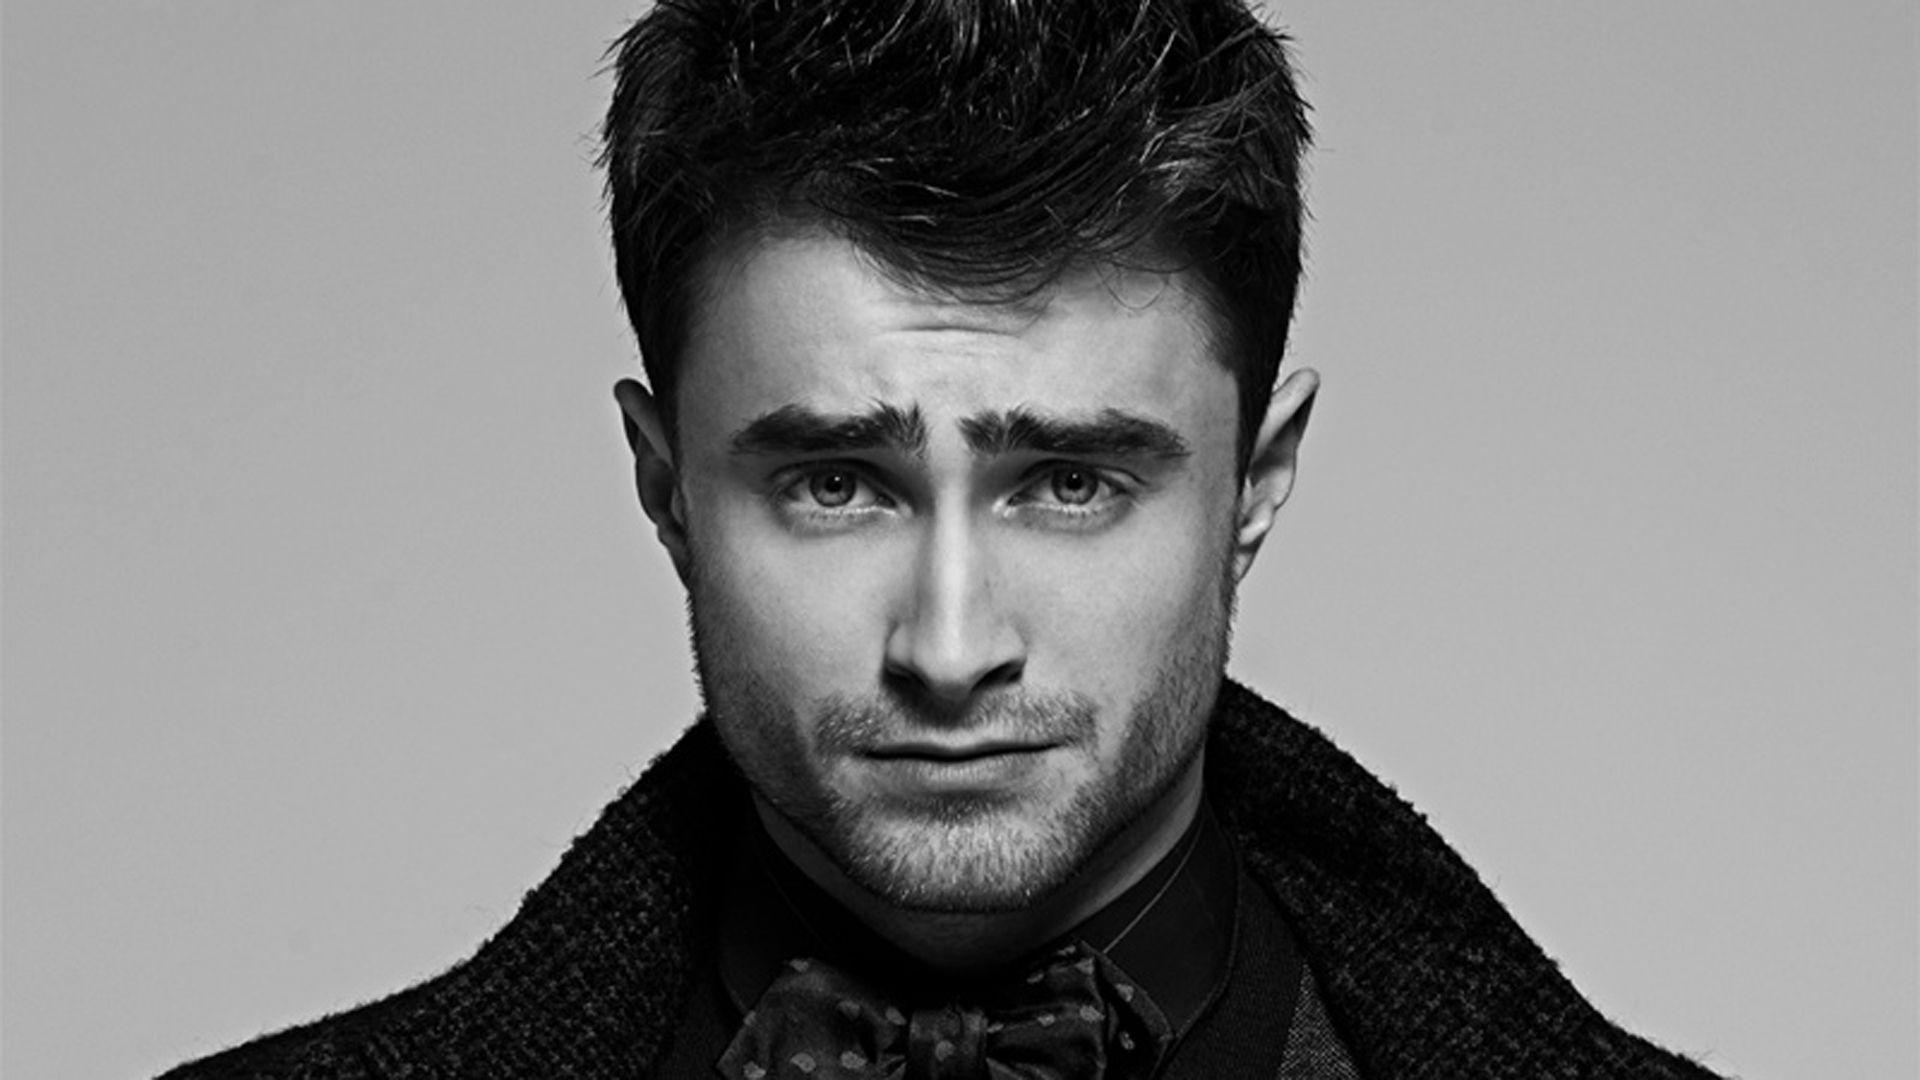 Daniel Radcliffe 2017 Wallpapers - Wallpaper Cave Daniel Radcliffe